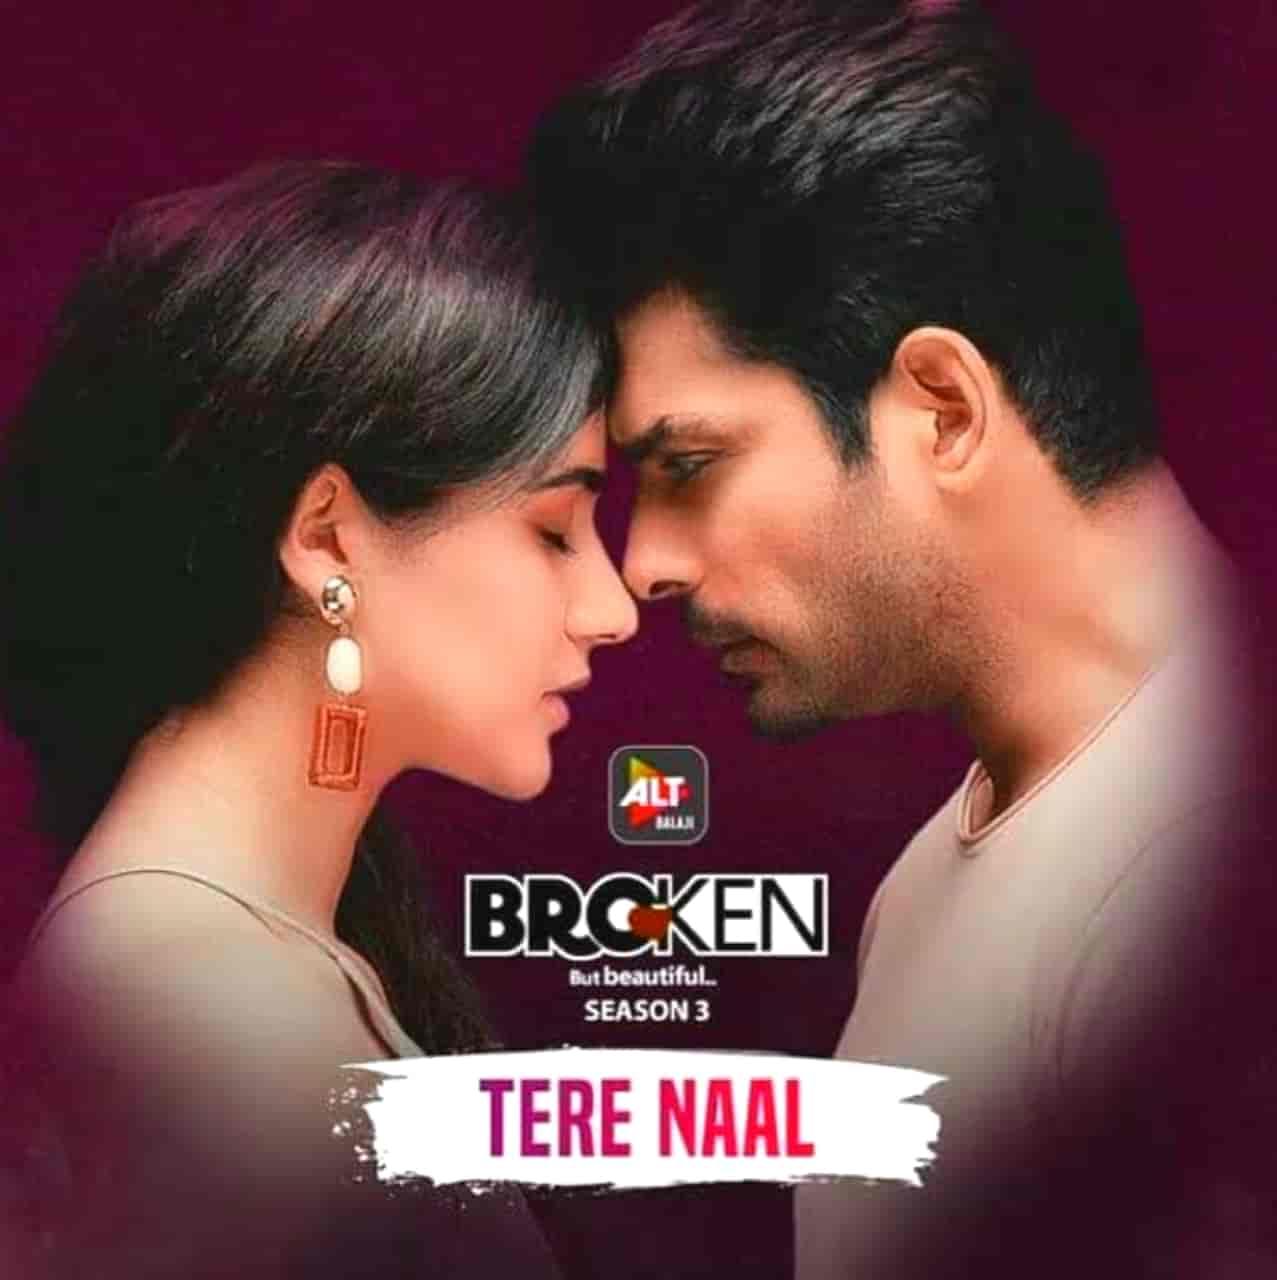 Tere Naal Punjabi Track From Broken But Beautiful Season 3